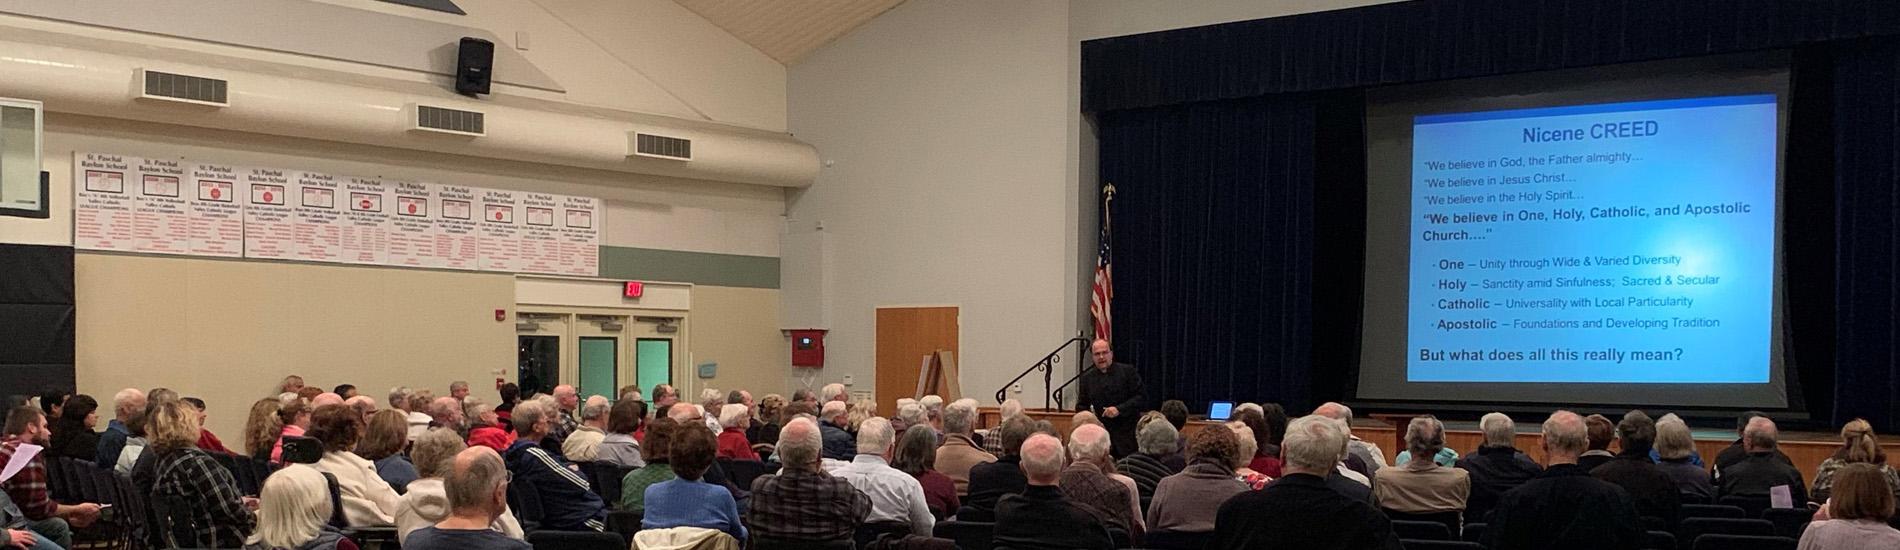 Father Felix 2019 presentation